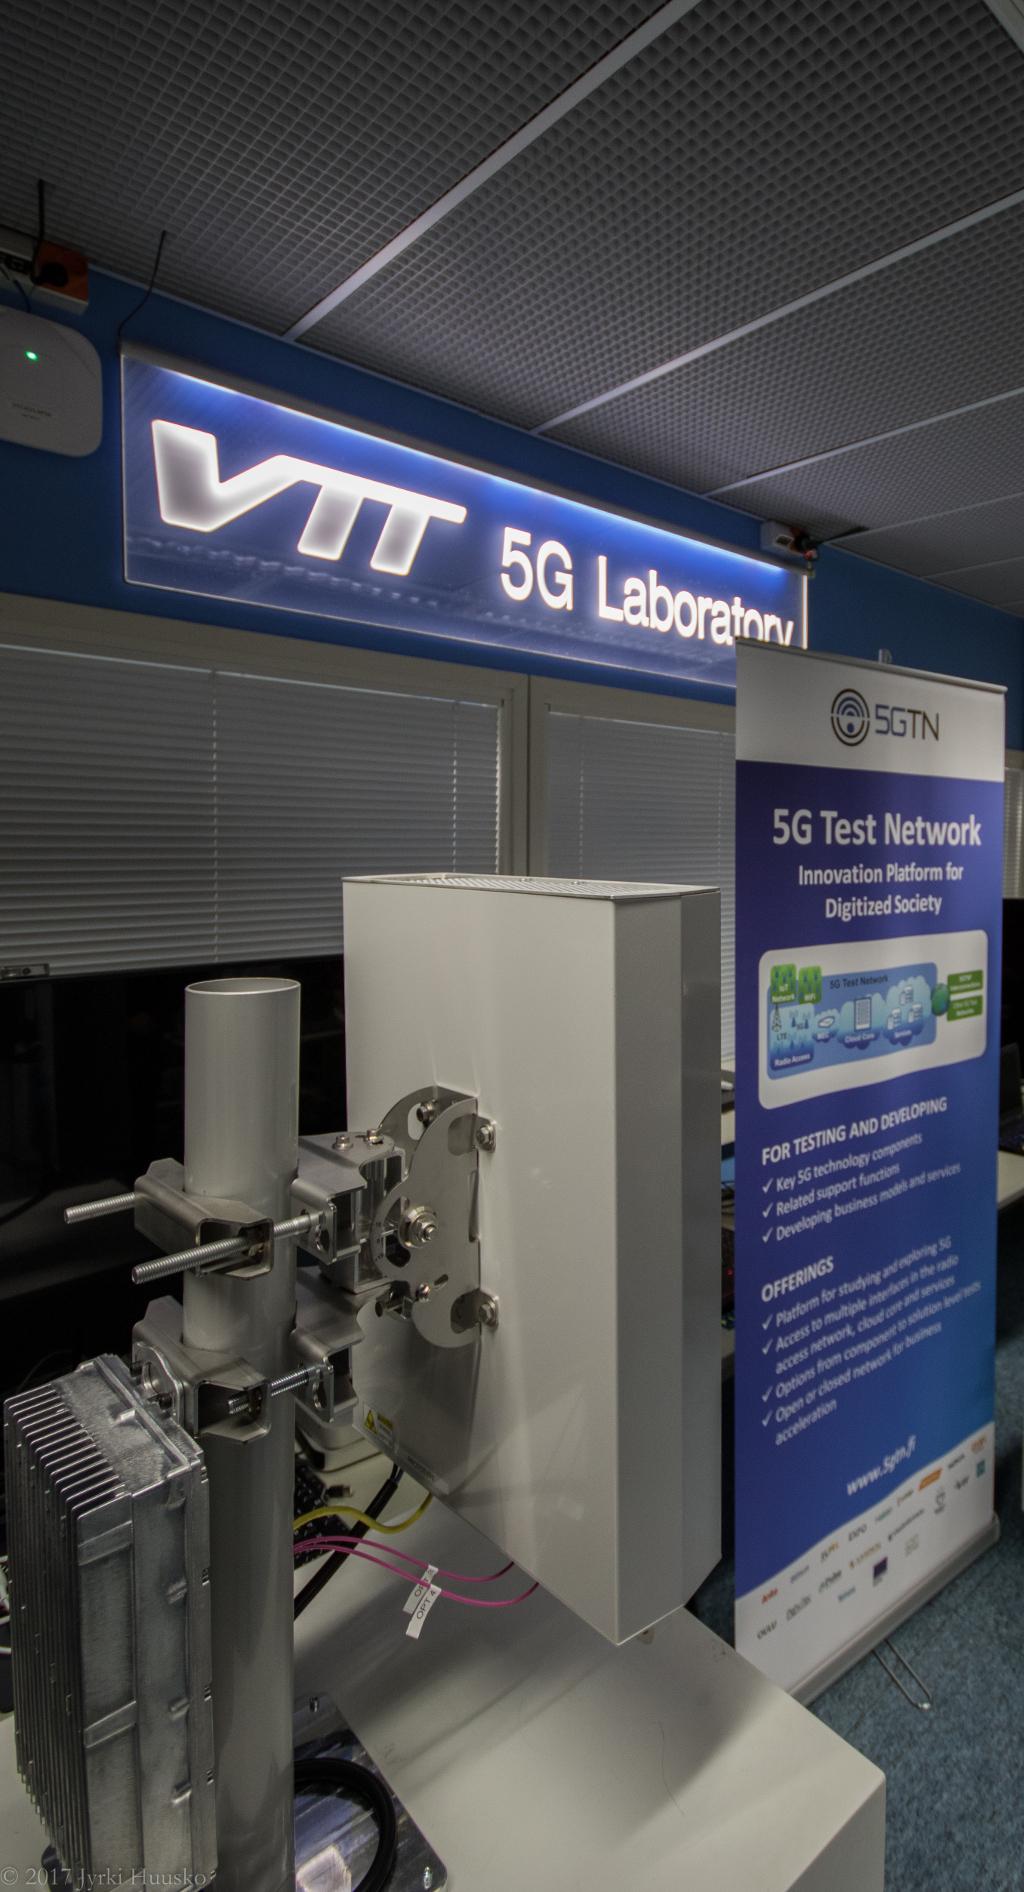 Laboratoire 5G de VTT (credits: Jyrki Huusko / Flickr Creative Commons Attribution 2.0 Generic (CC BY 2.0))